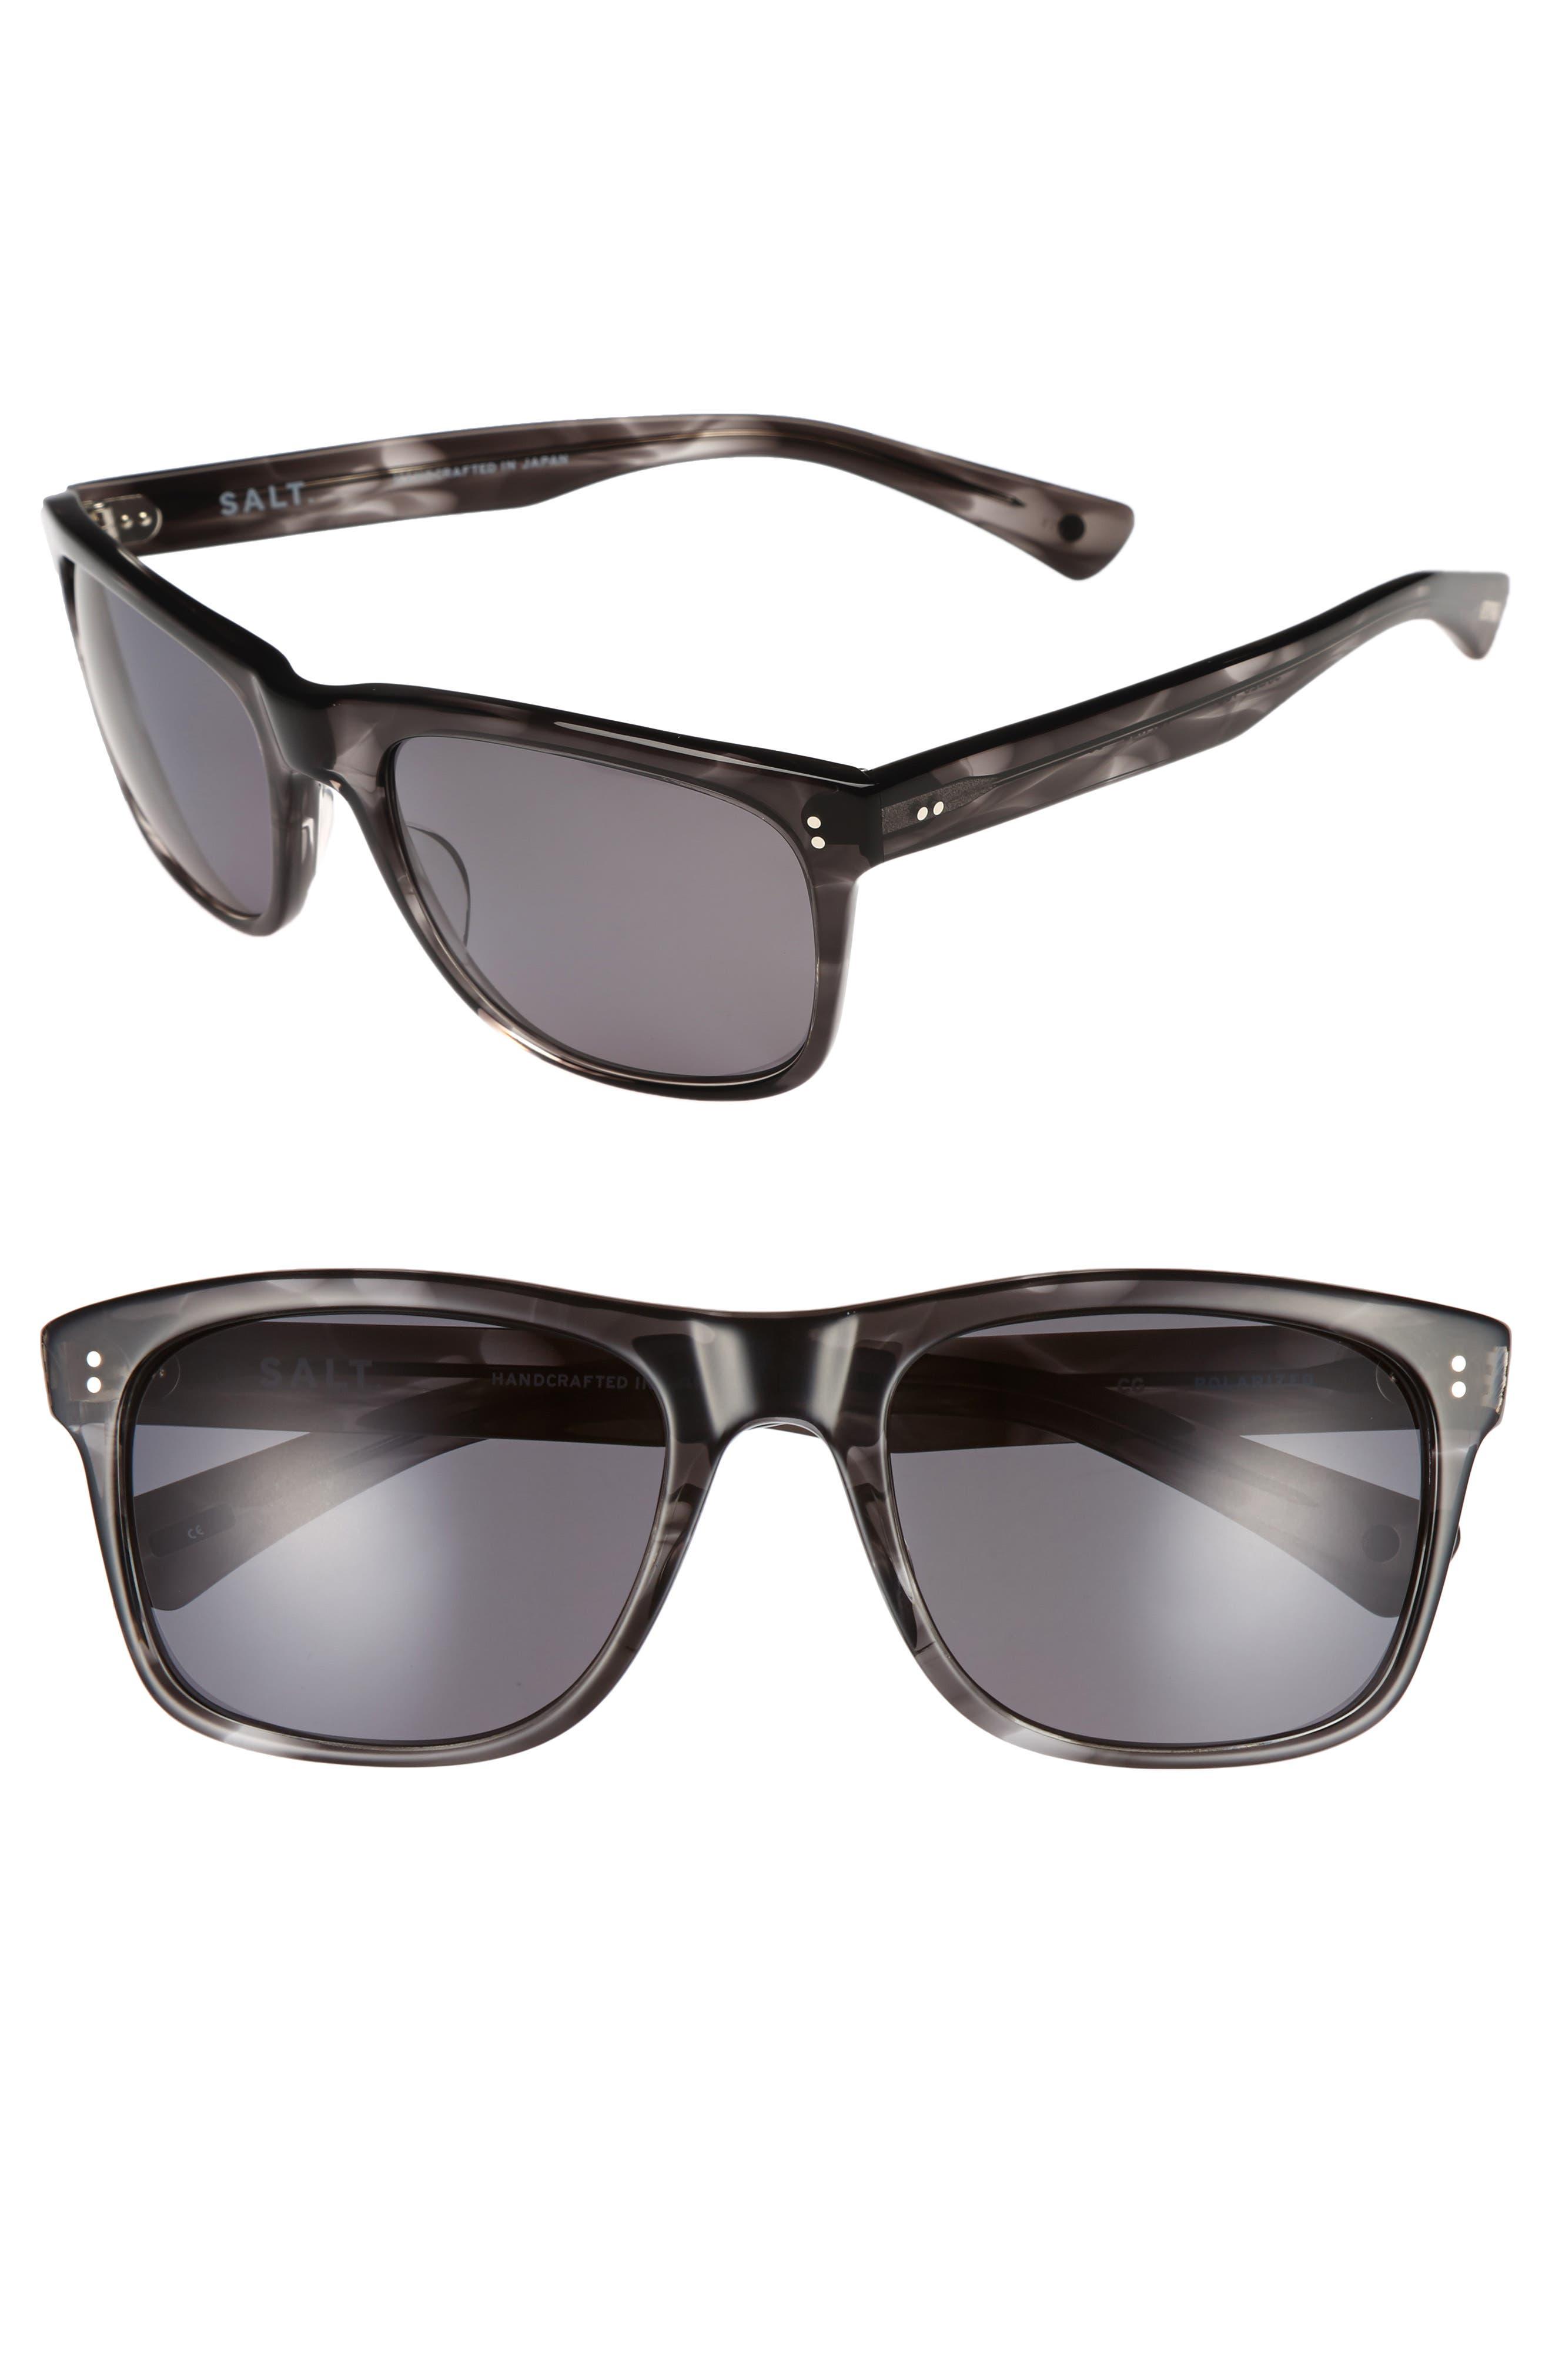 Tufnel 52mm Polarized Sunglasses,                             Main thumbnail 1, color,                             COLD GREY